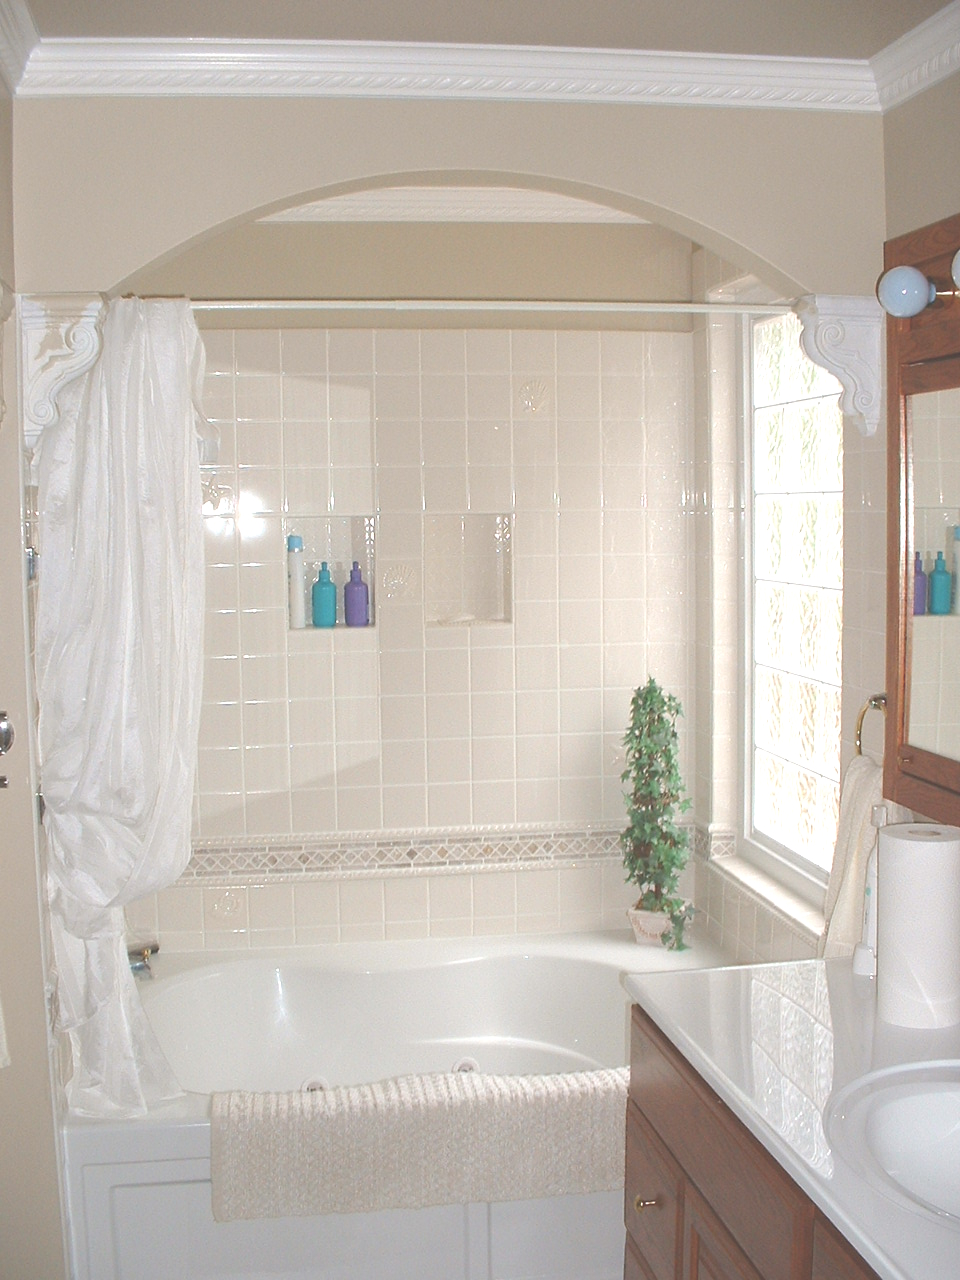 Bathroom Remodel Kitsap County tyson construction new home construction, tyson construction